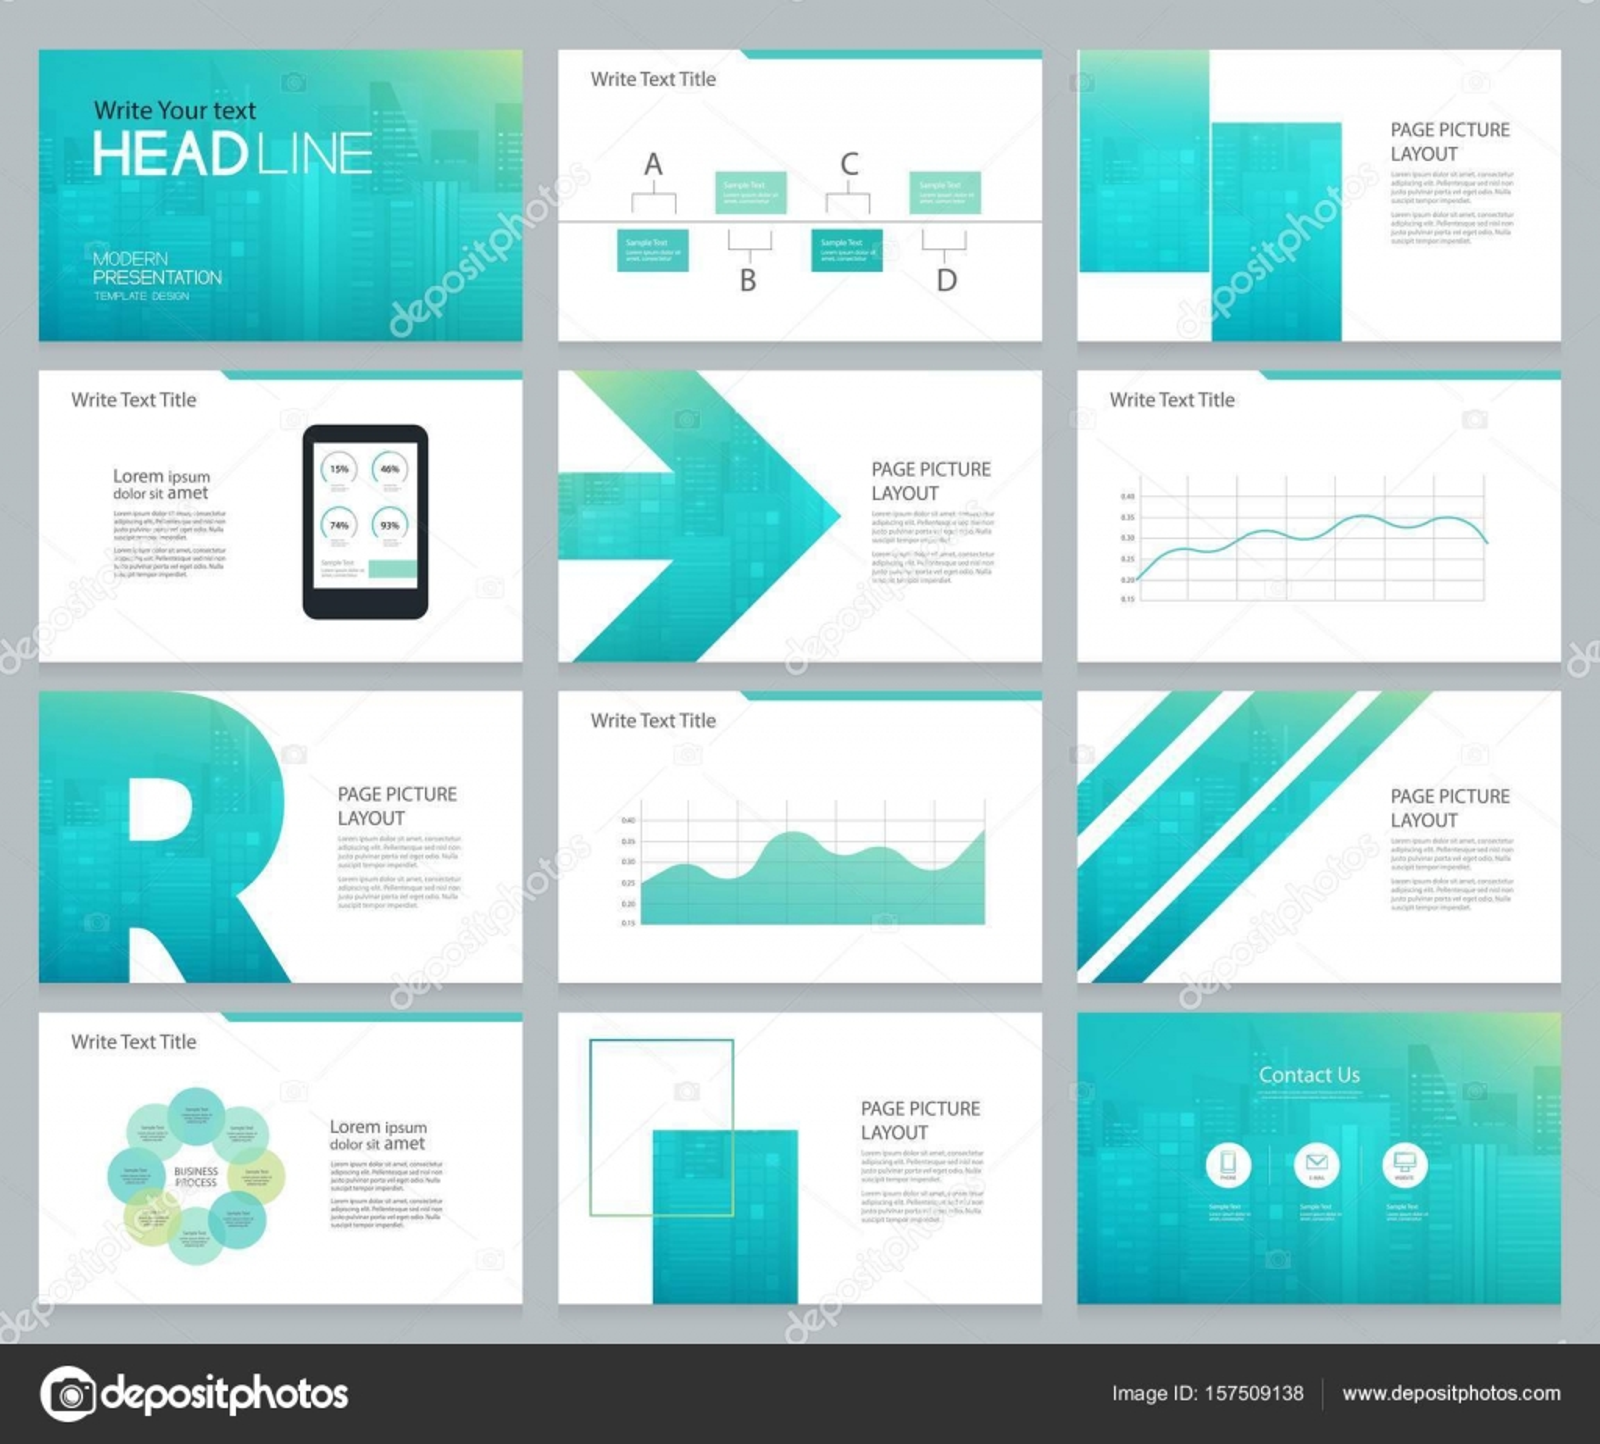 Presentation and slide layout template design vector image.